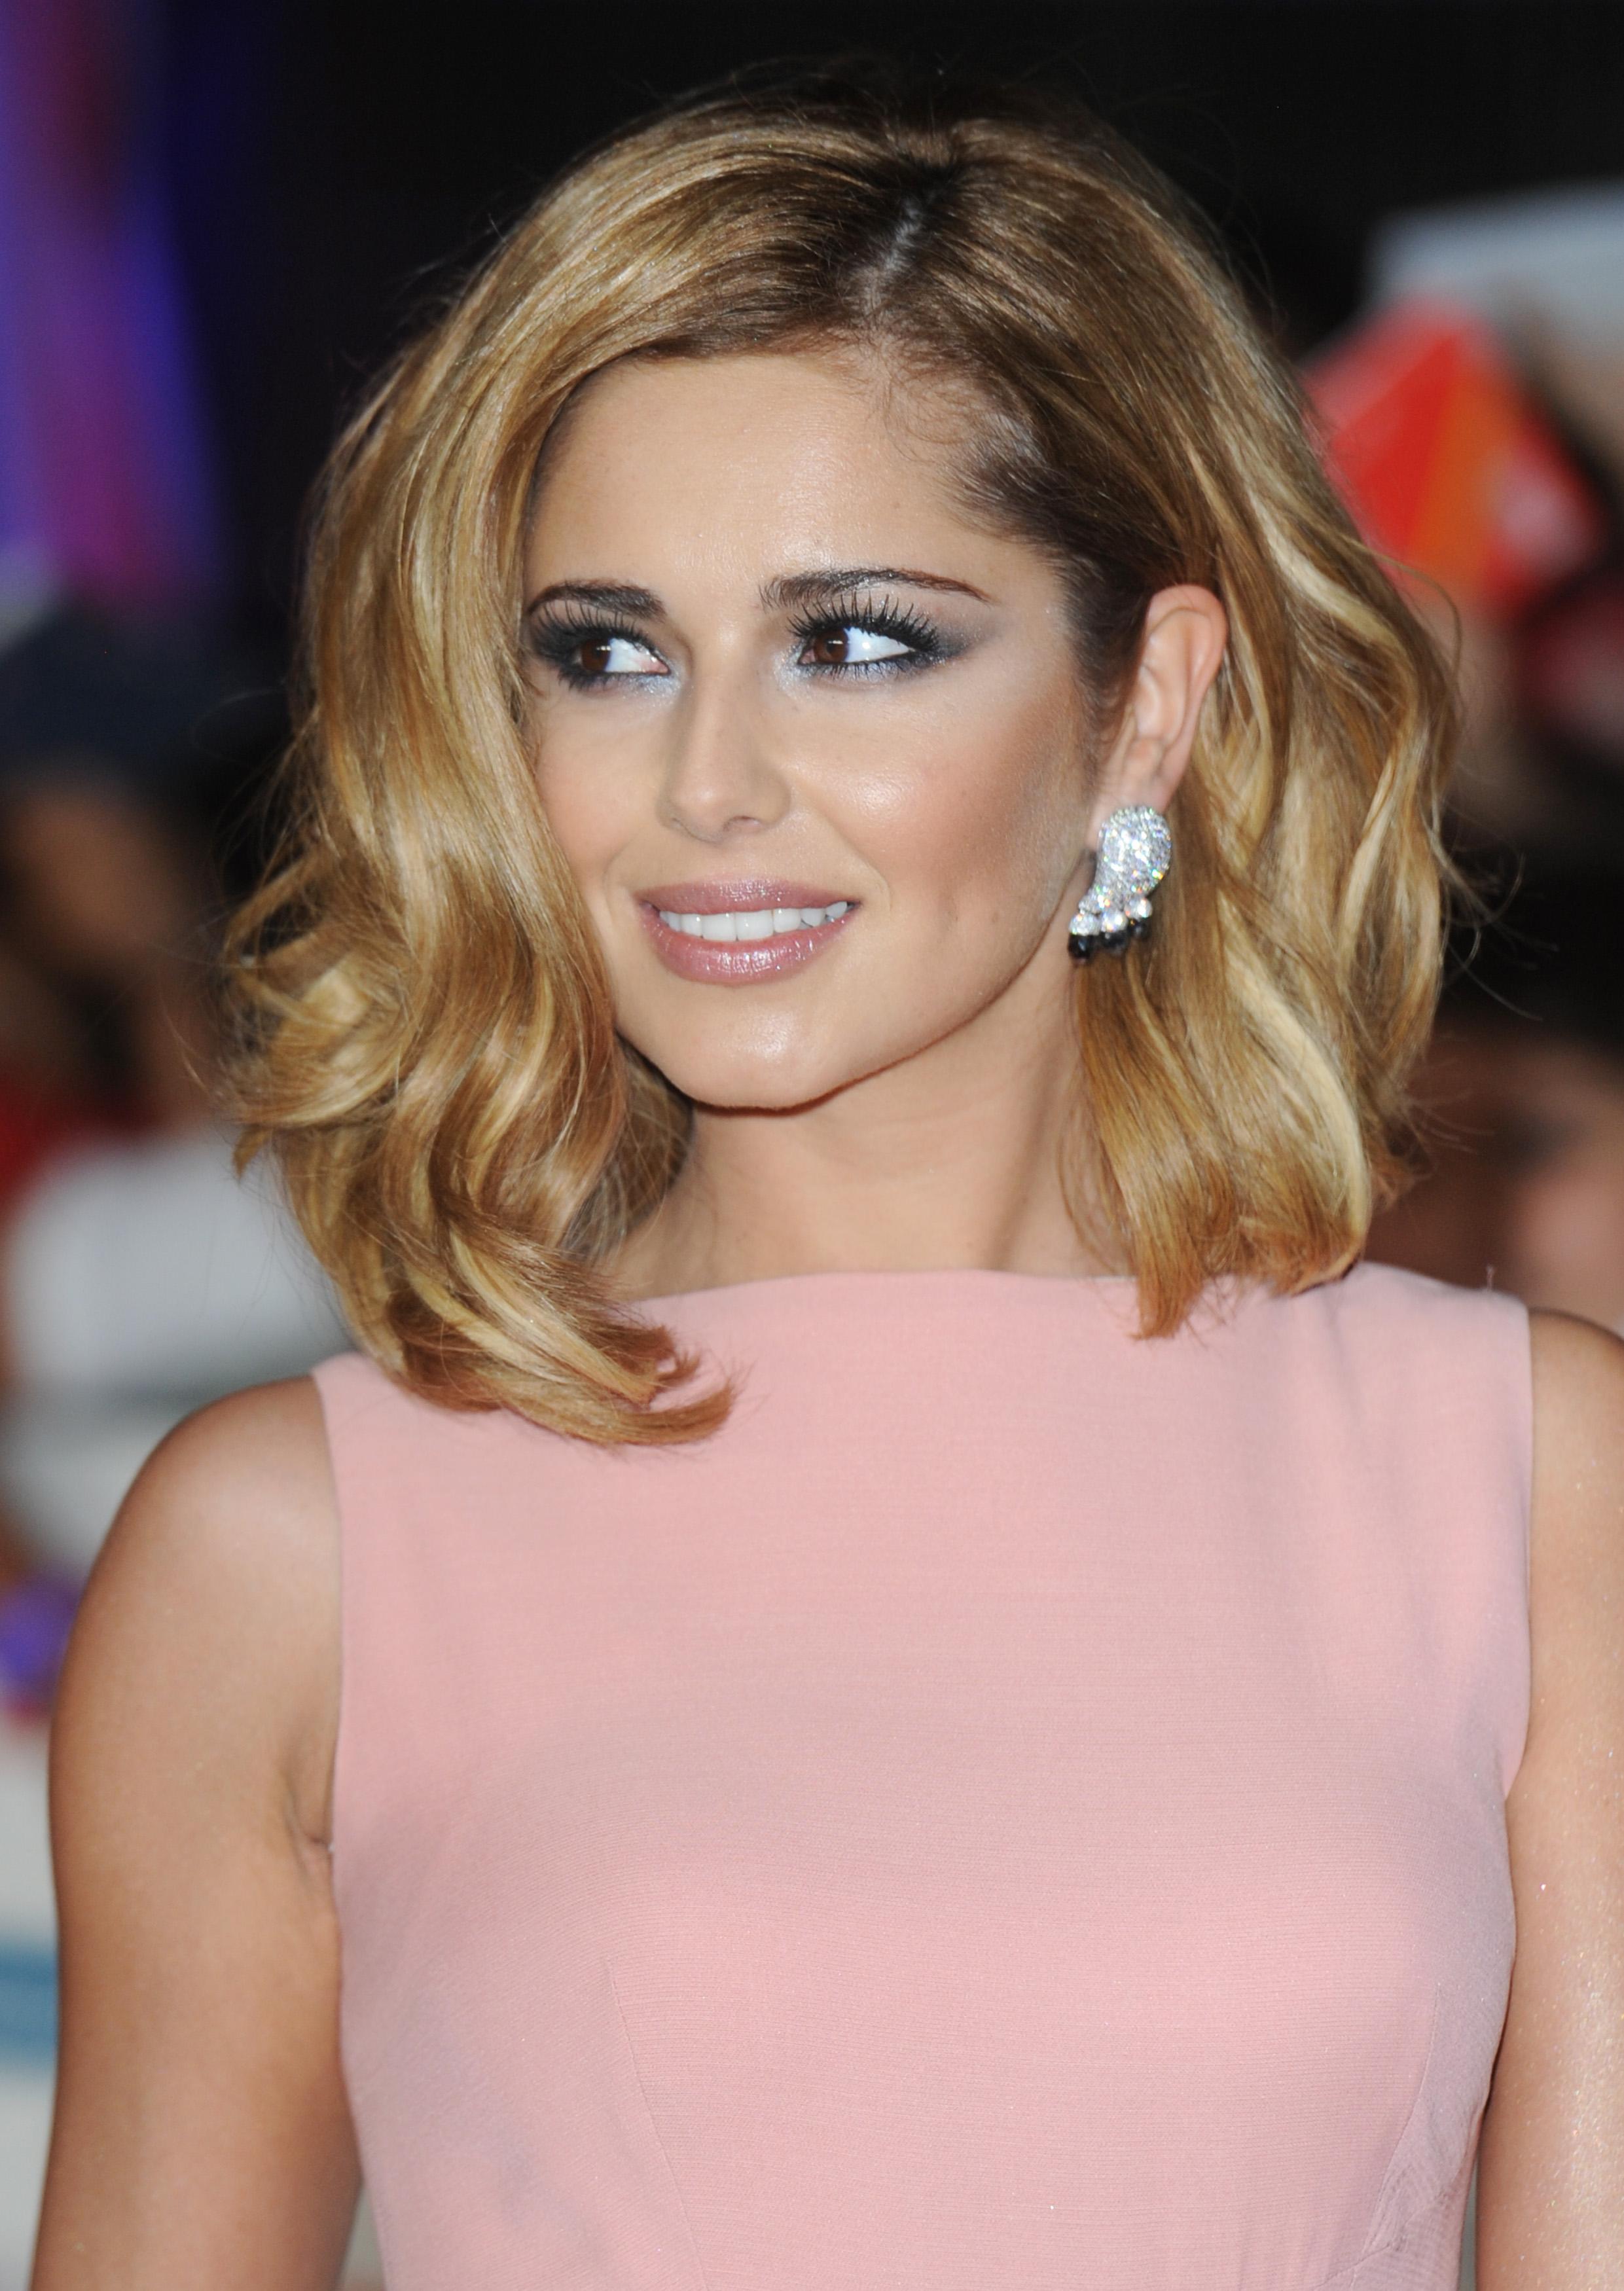 Cheryl Cole attends